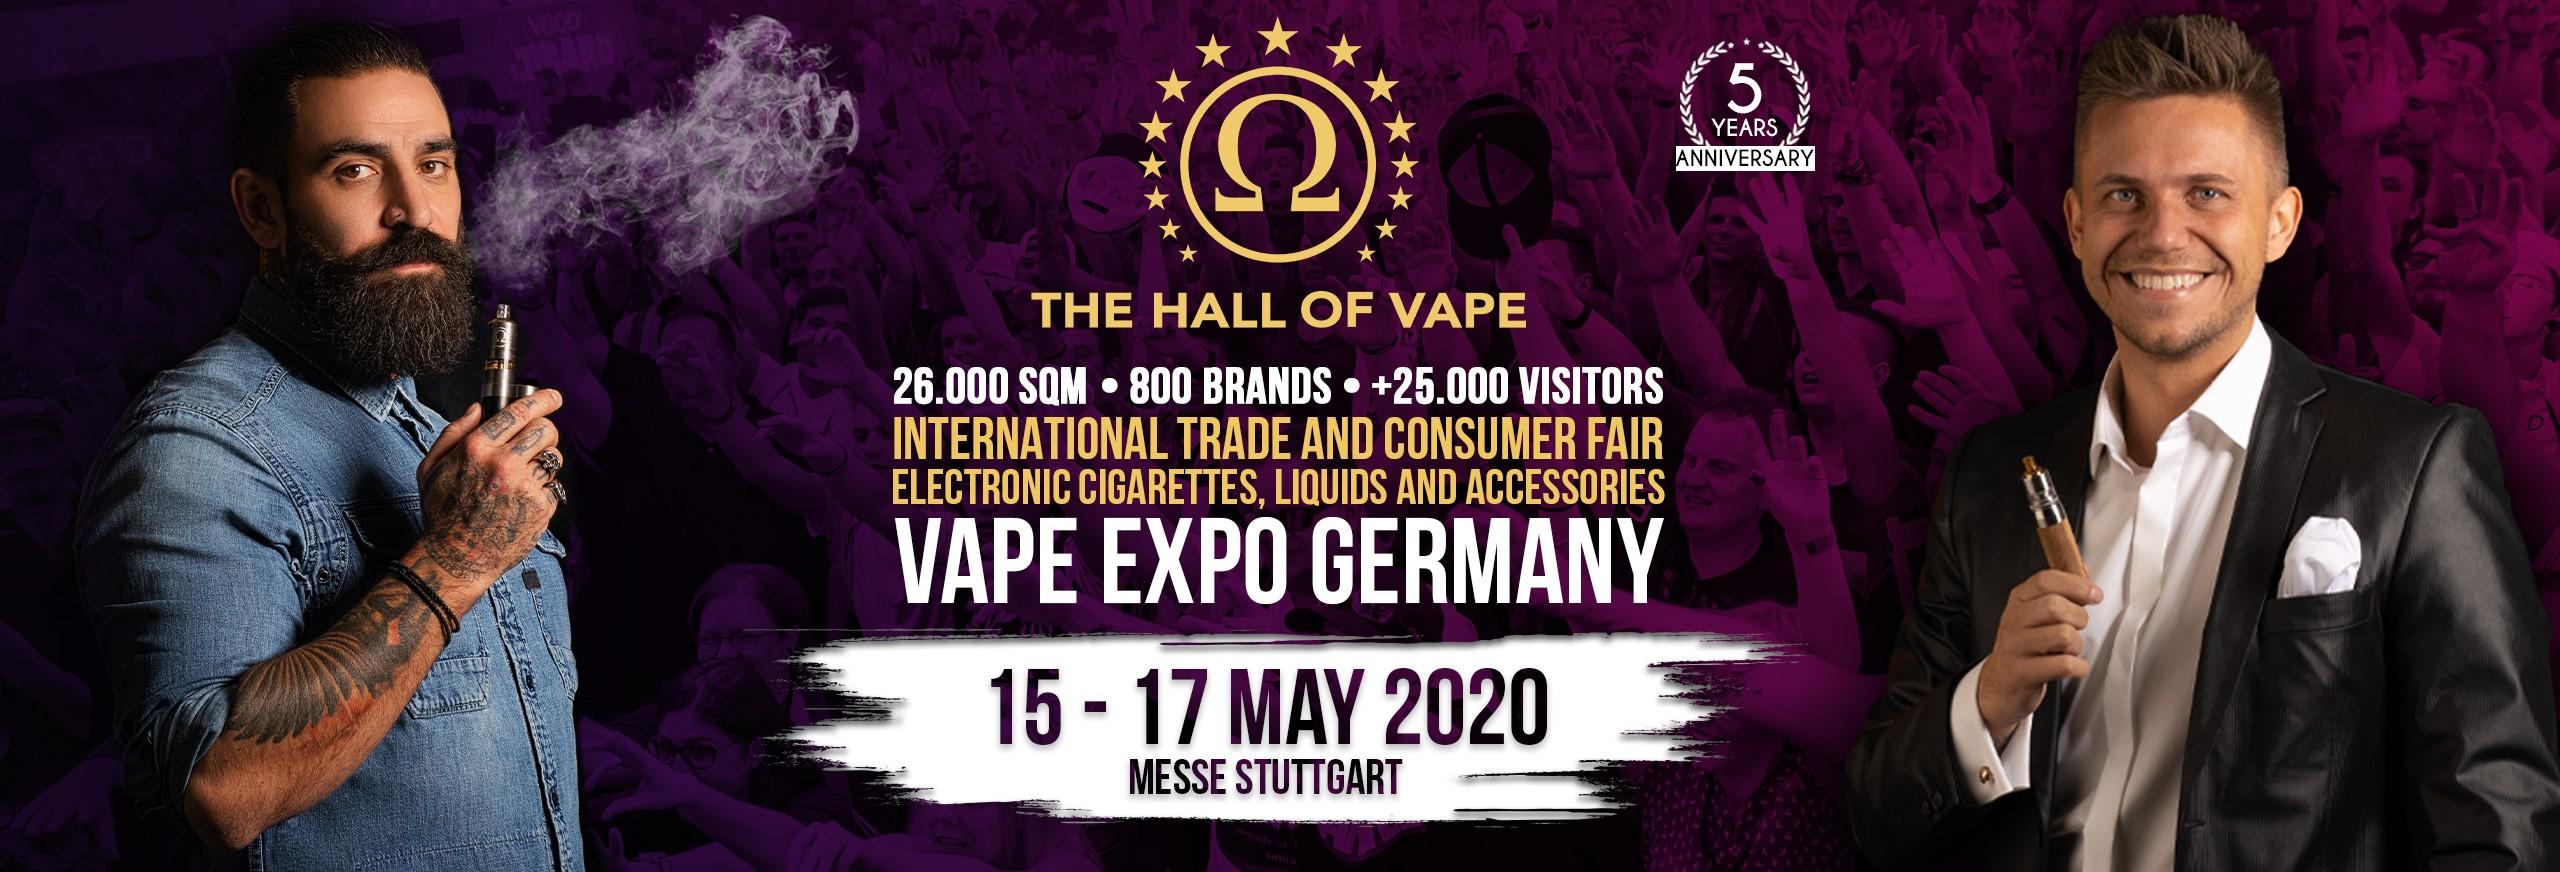 advertising banner for The Hall of Vape Vape Expo Germany 2020